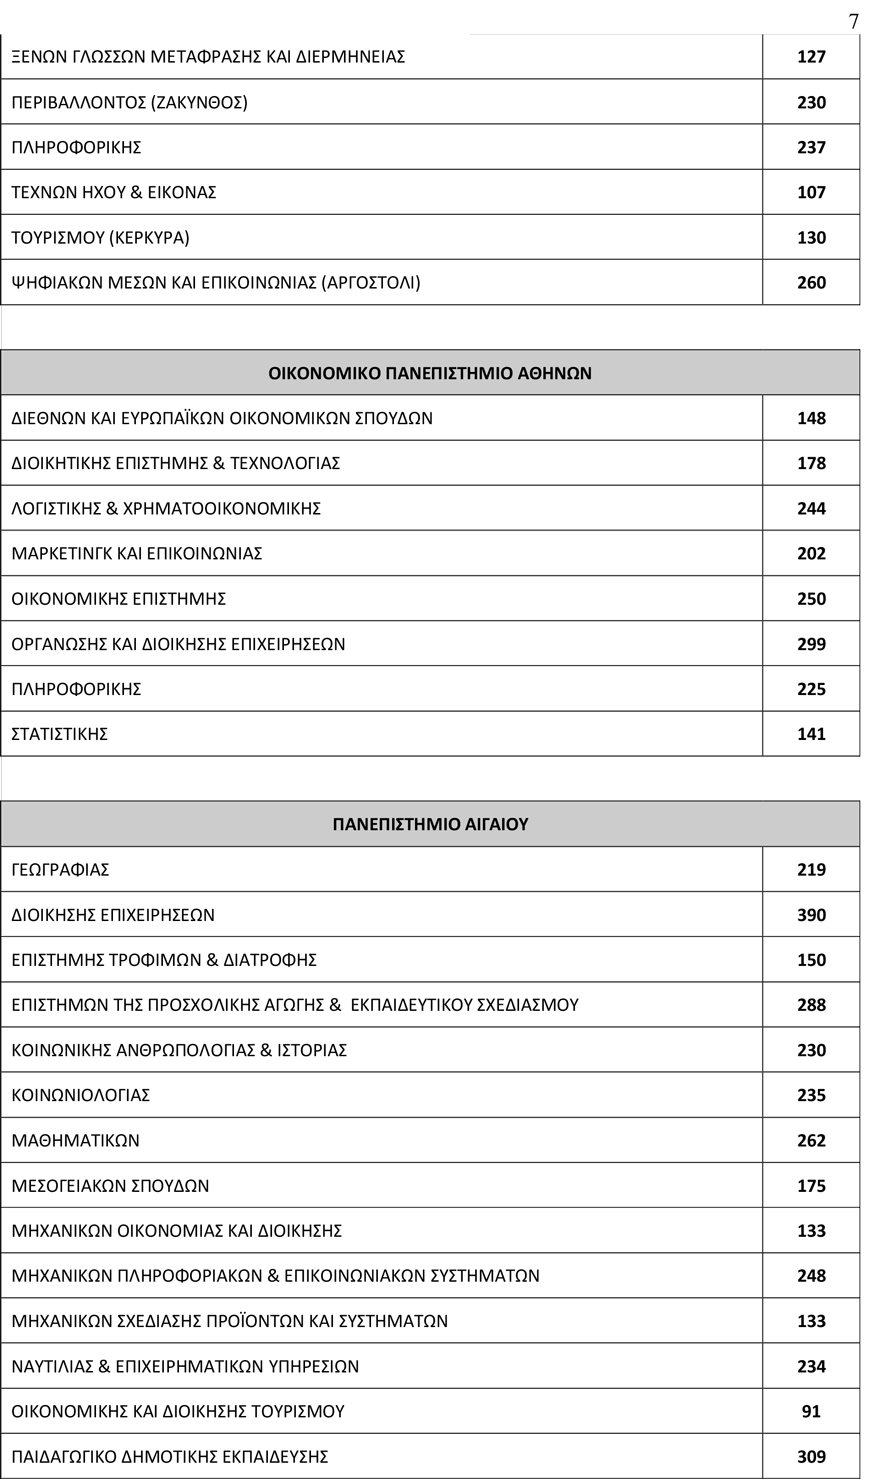 arrithmos_eisakt7 78.335 θα εισαχθούν φέτος στα Πανεπιστήμια - Αυξημένος κατά 3.500 ο αριθμός